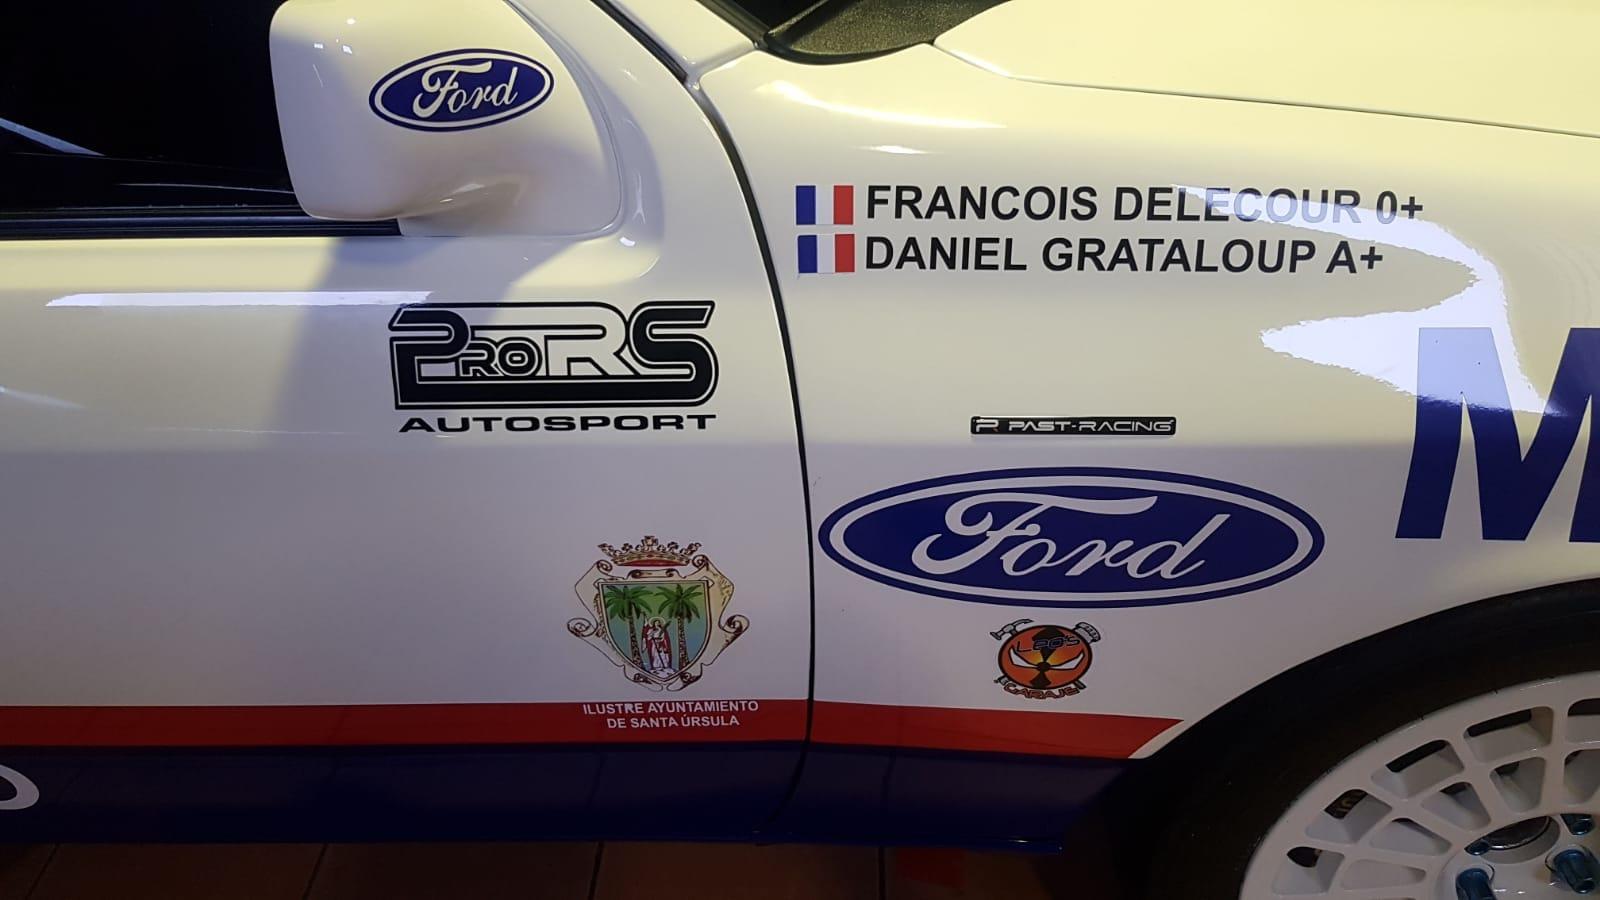 Ford Sierra Cosworth - Carlos Brito